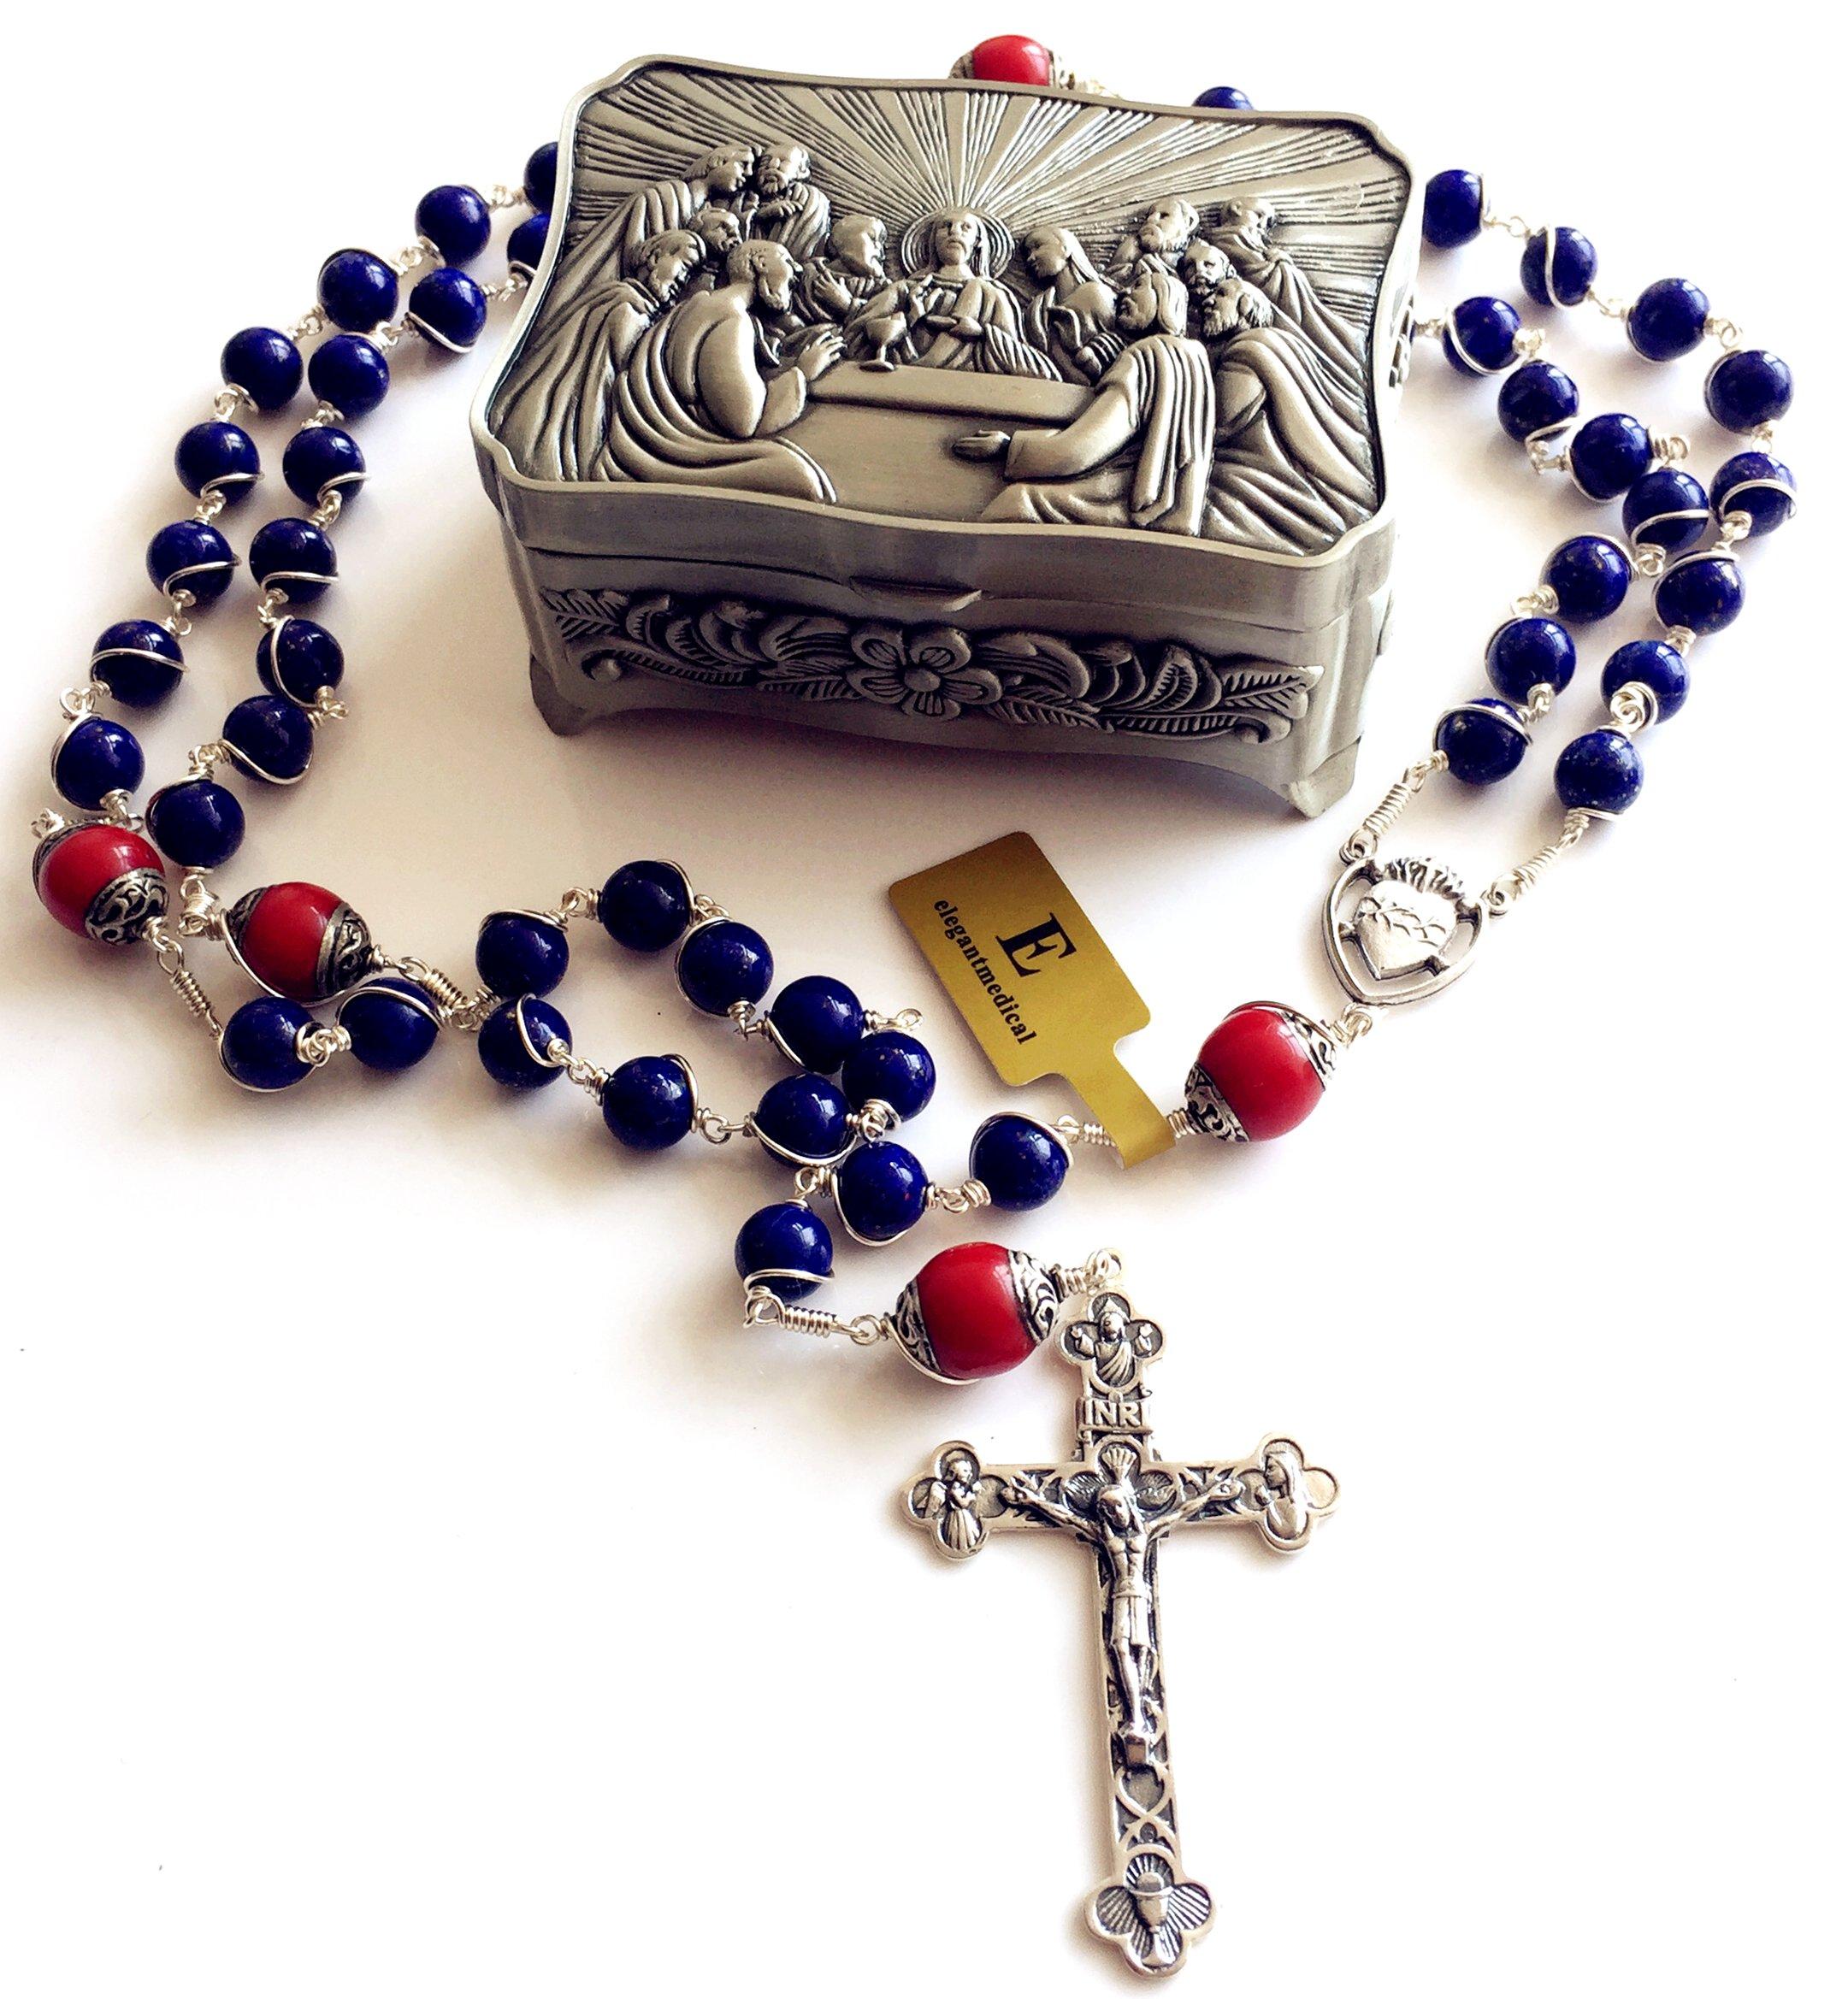 Handmade Sterling 925 Silver Lapis Lazuli Beads Rosary Cross Crucifix Catholic Necklace Gifts by elegantmedical (Image #2)